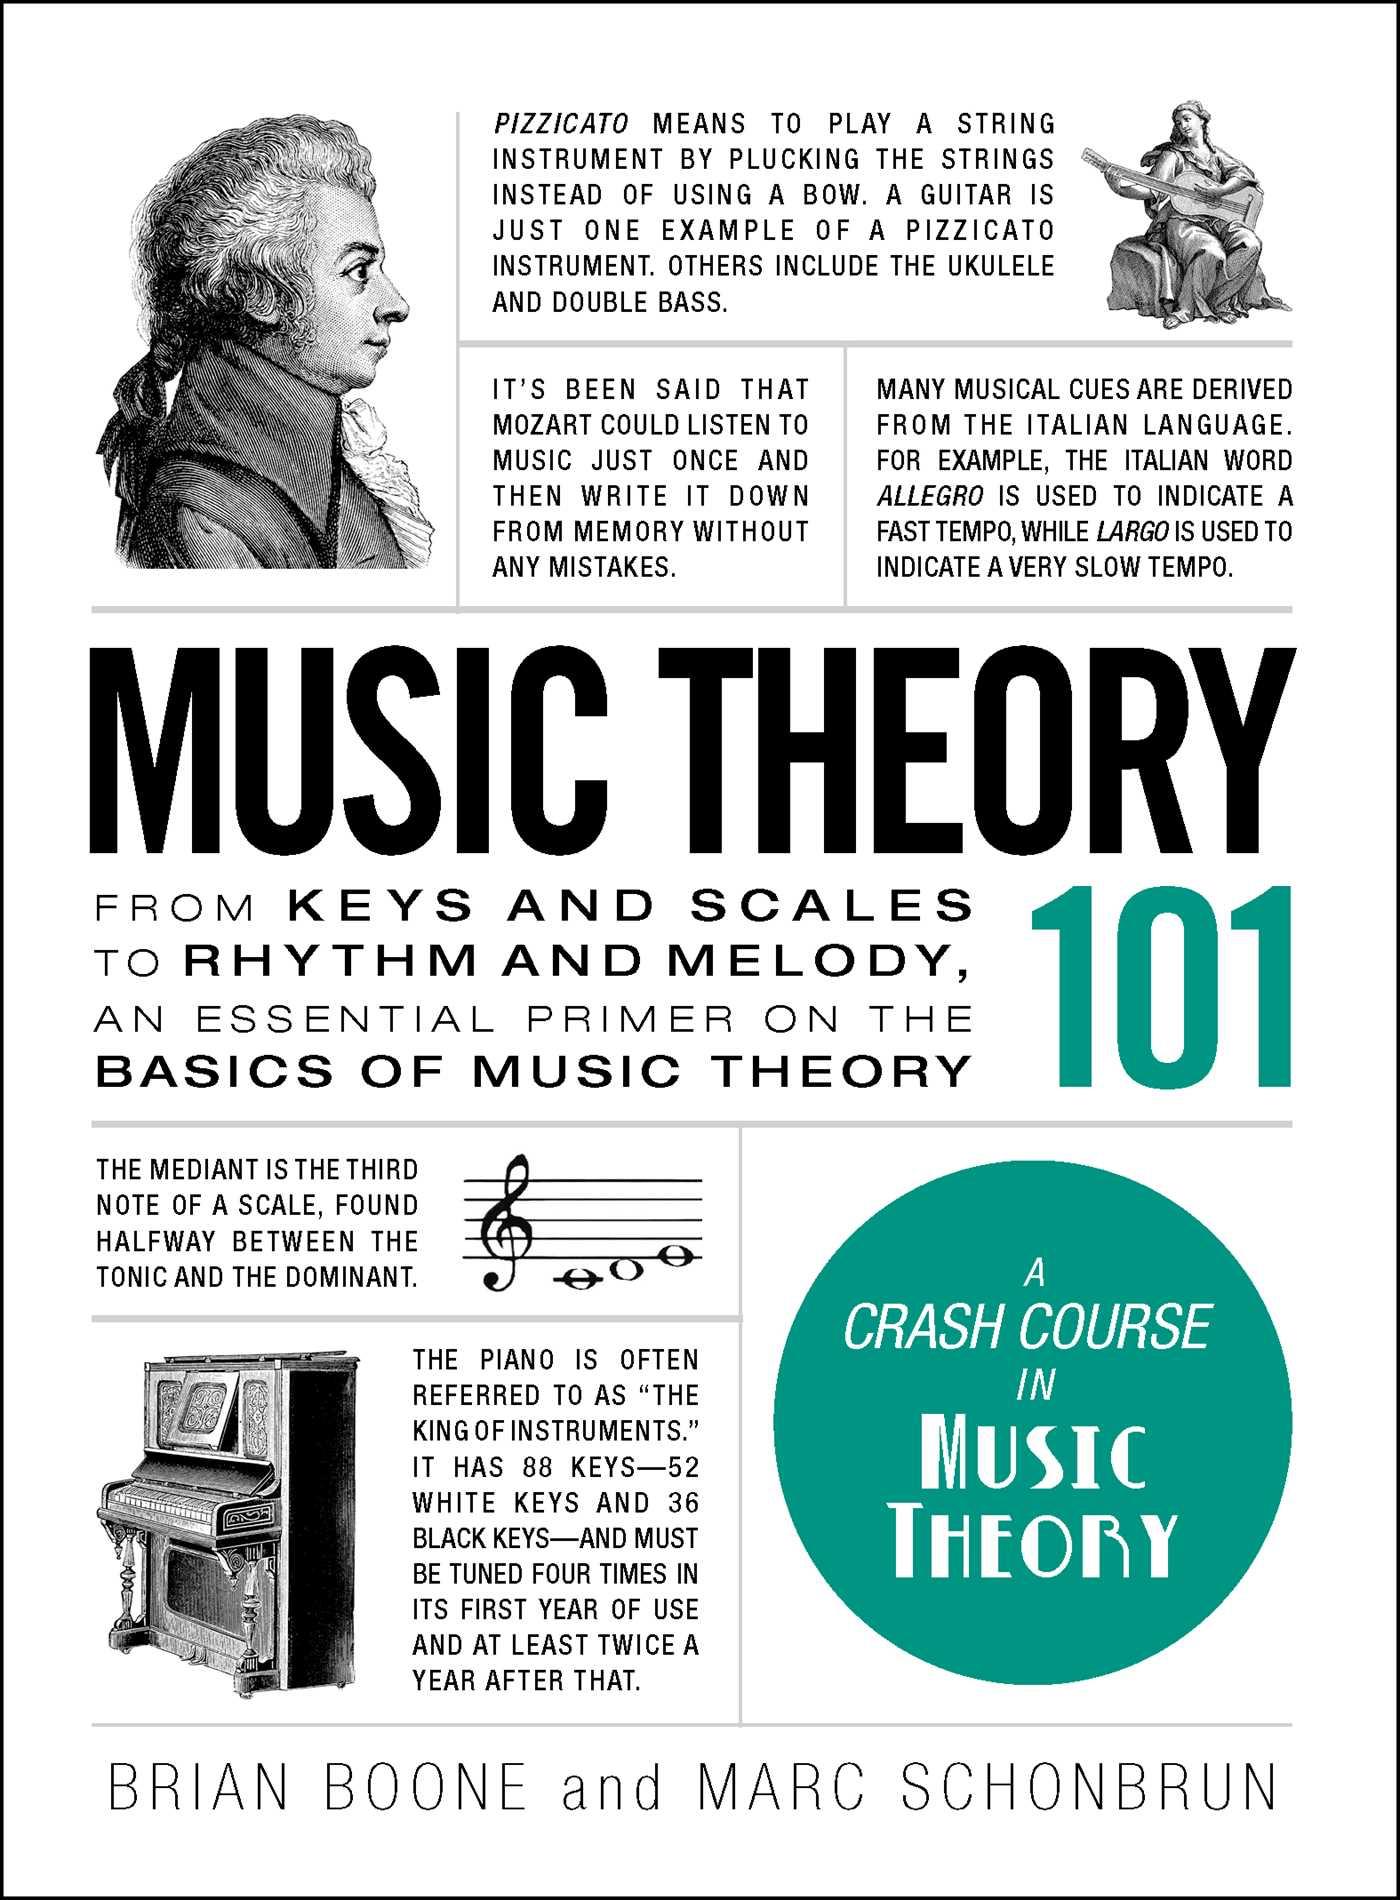 theory music 101 brian boone schonbrun marc books basics rhythm melody adams scales primer